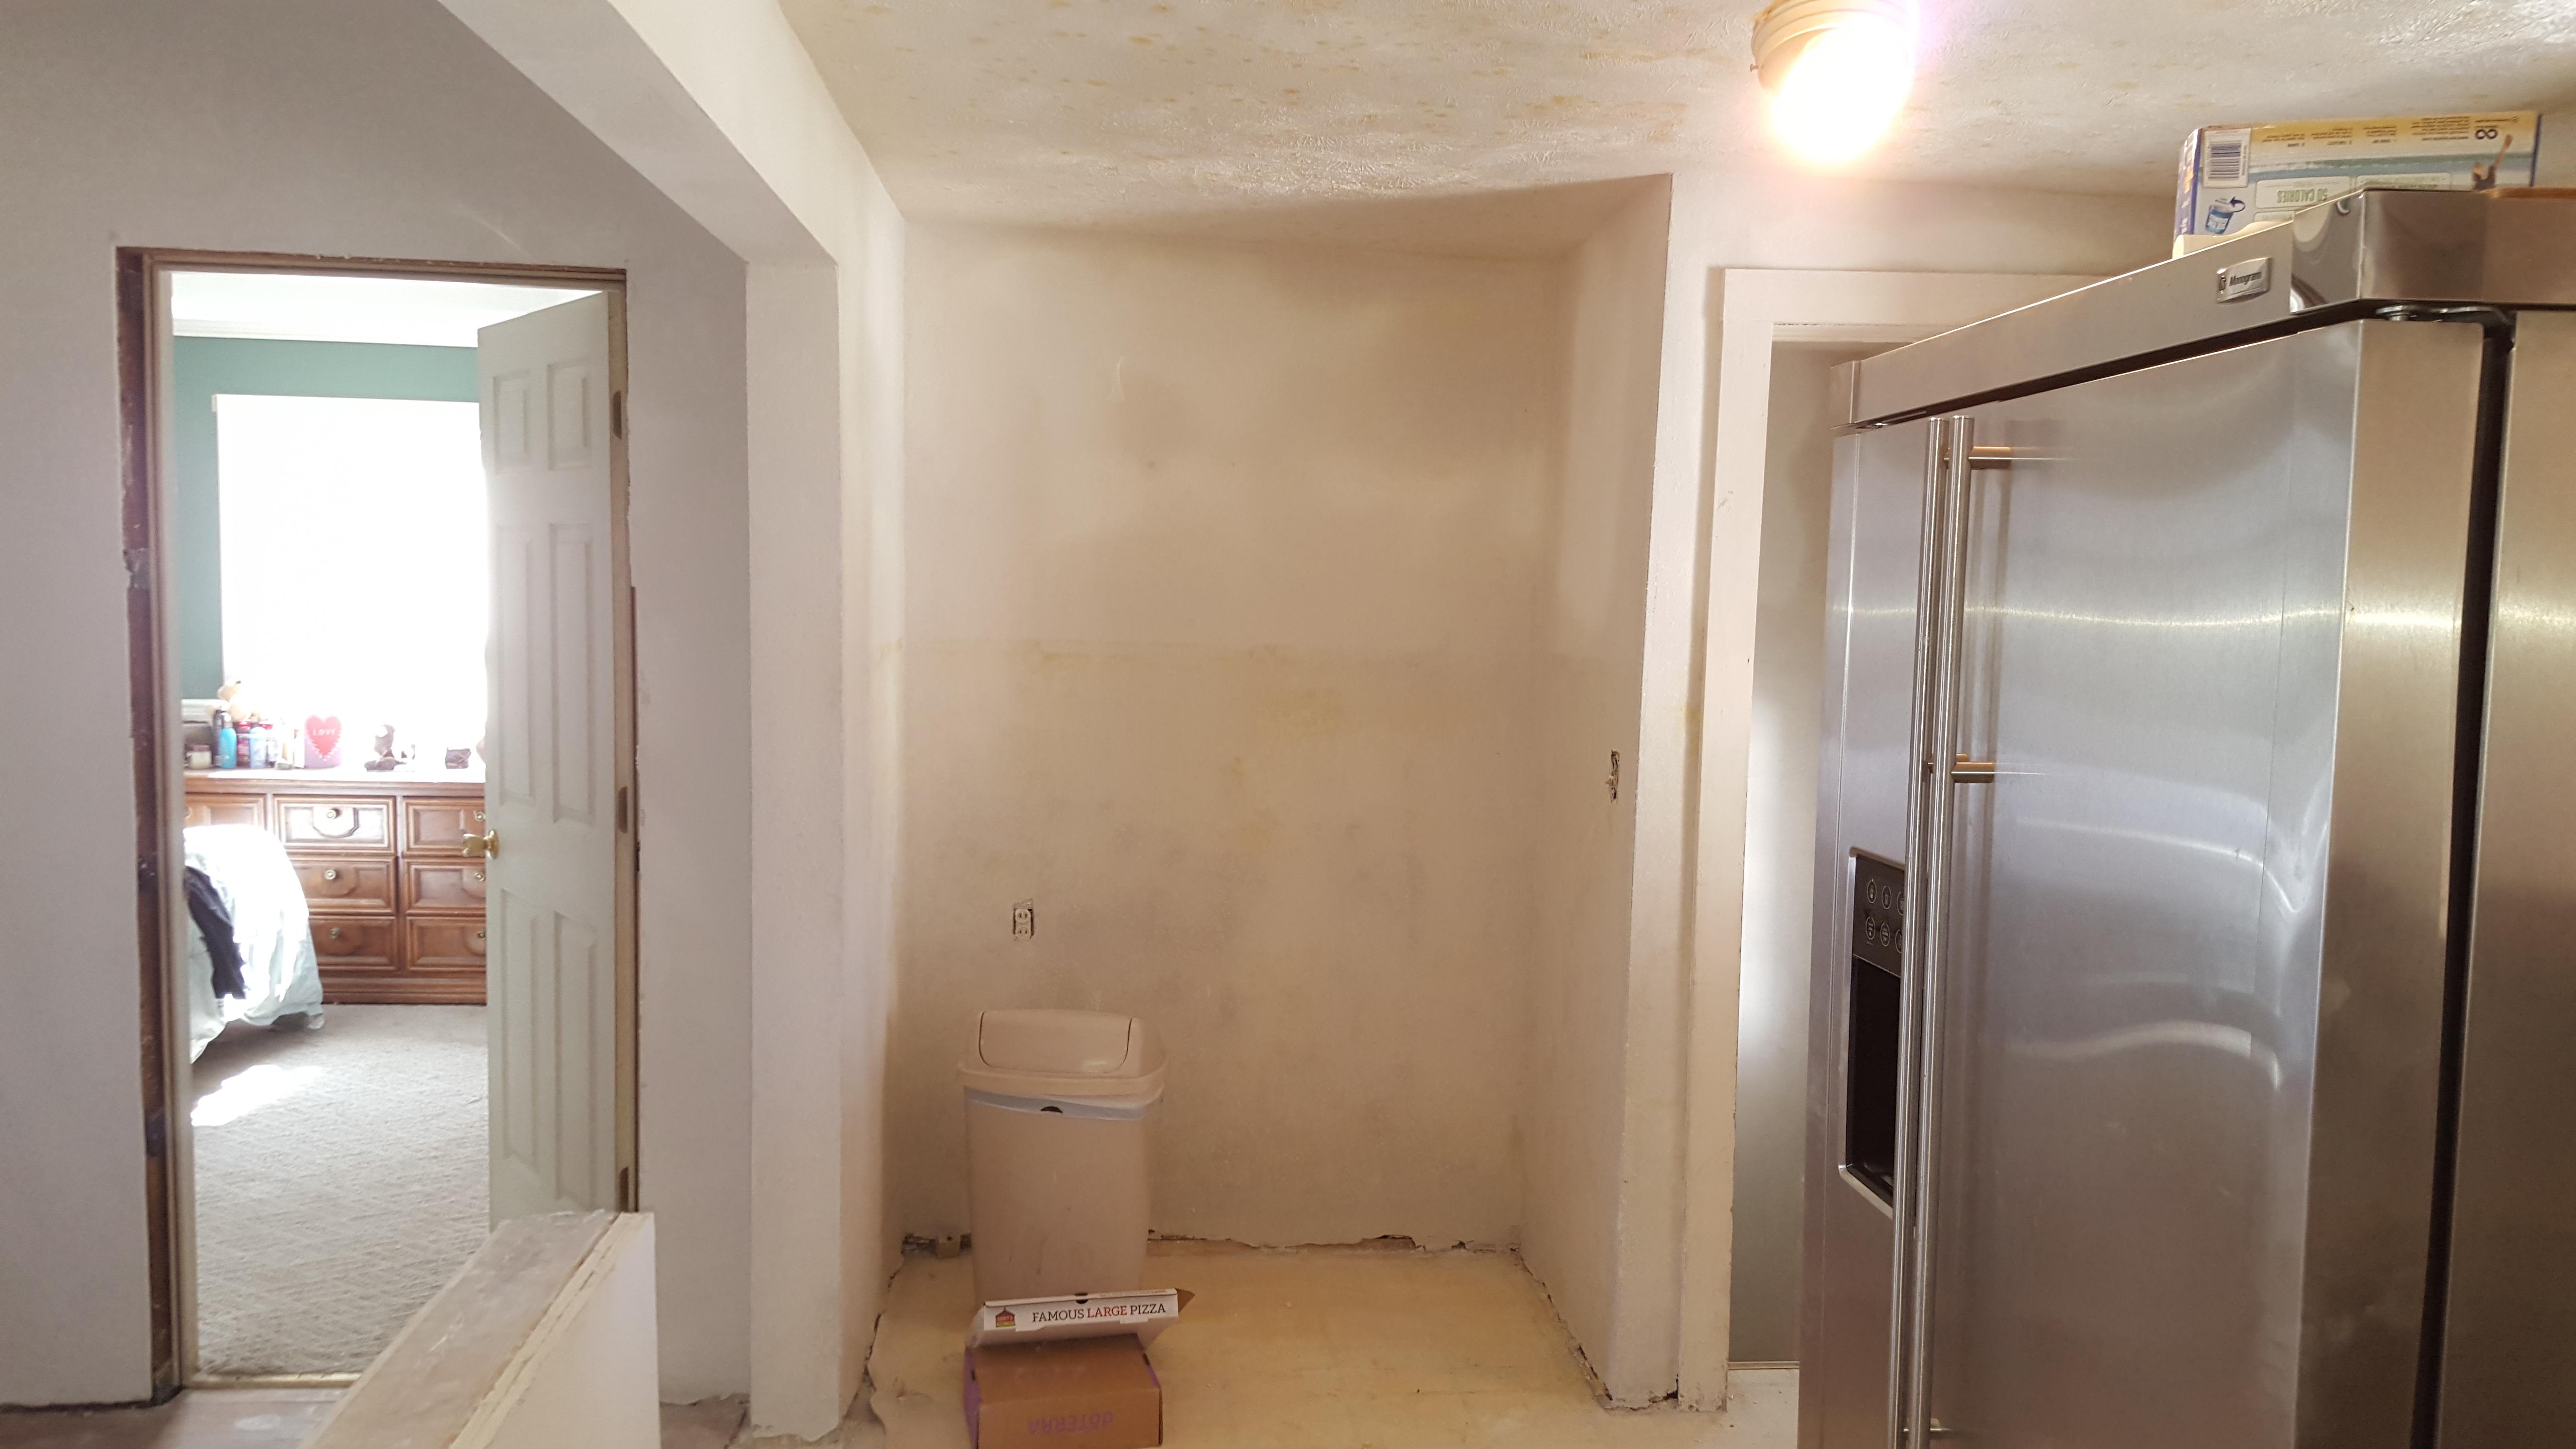 skim coat plaster finish